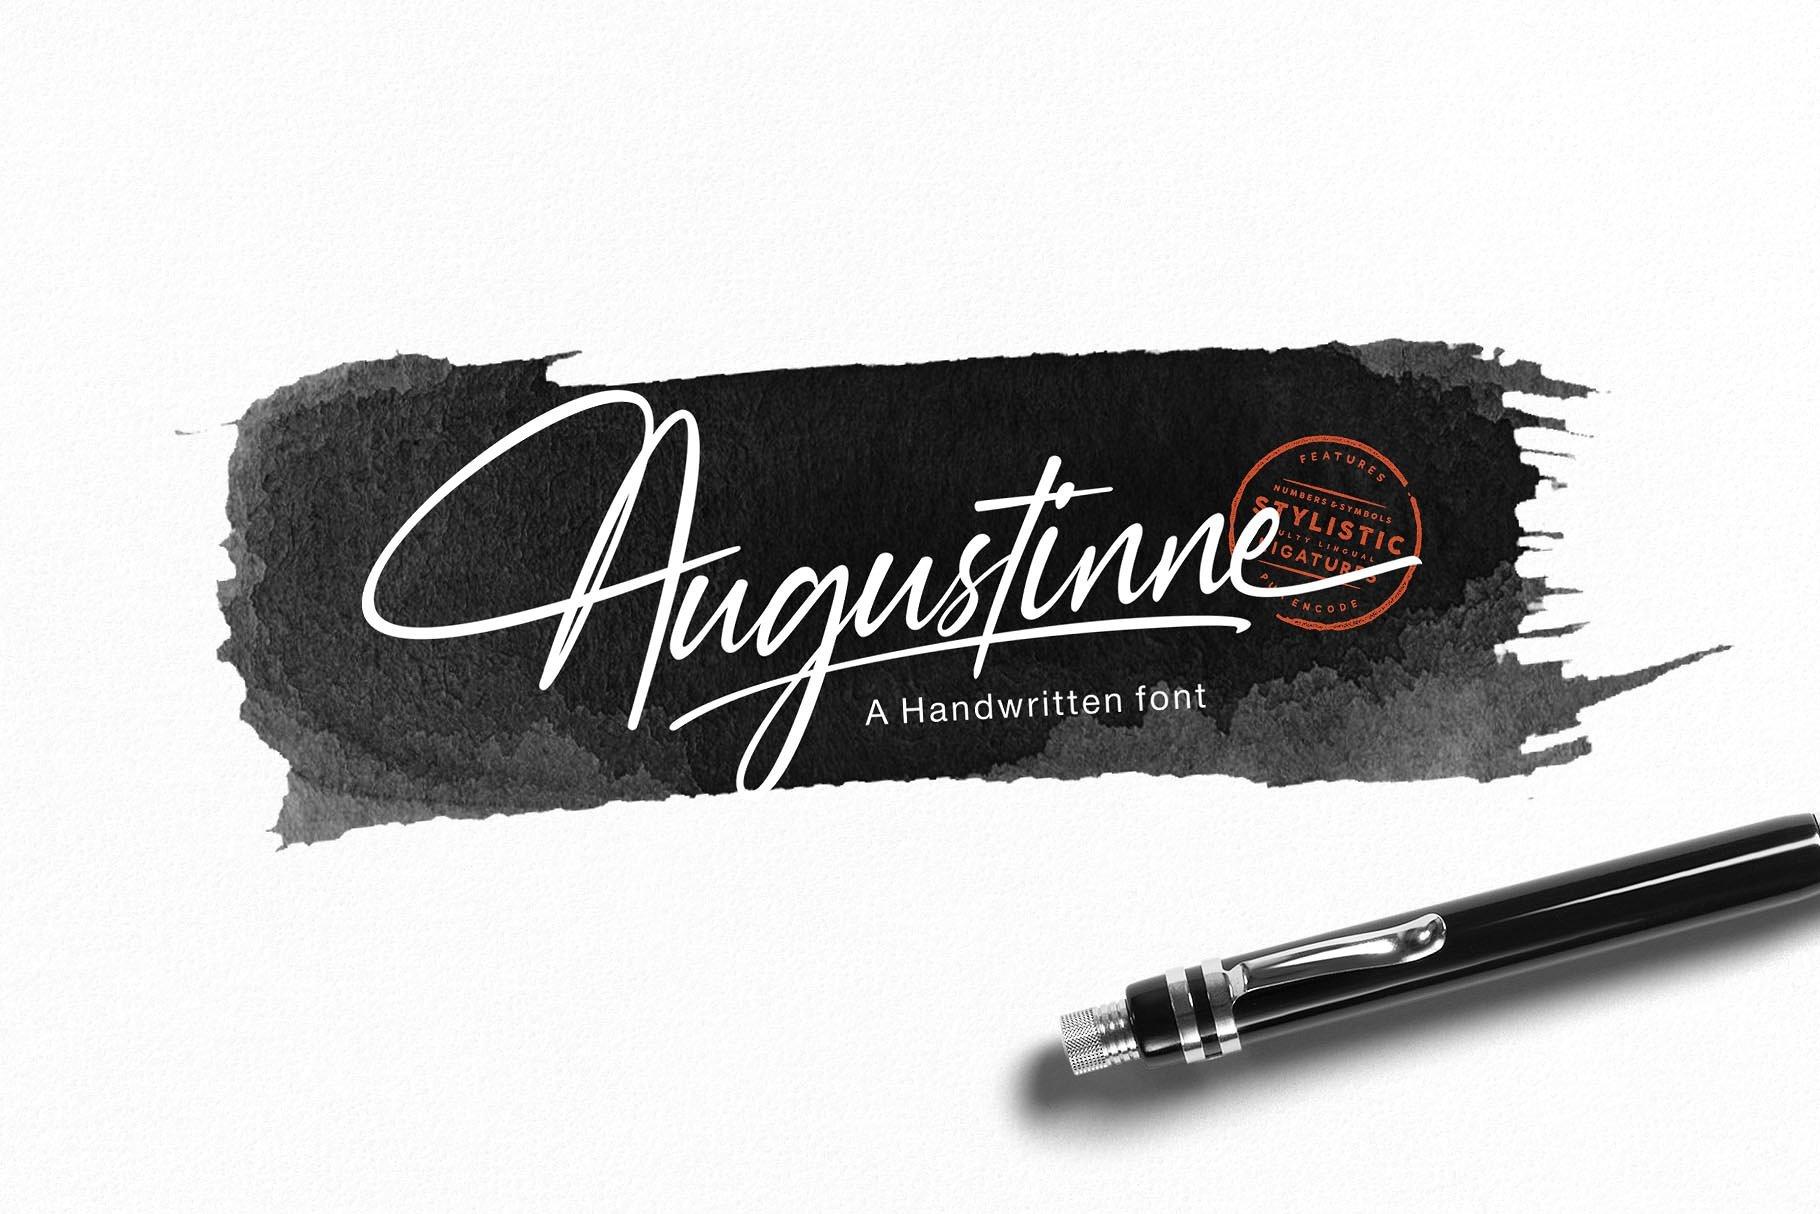 augustinne-handwritten-font